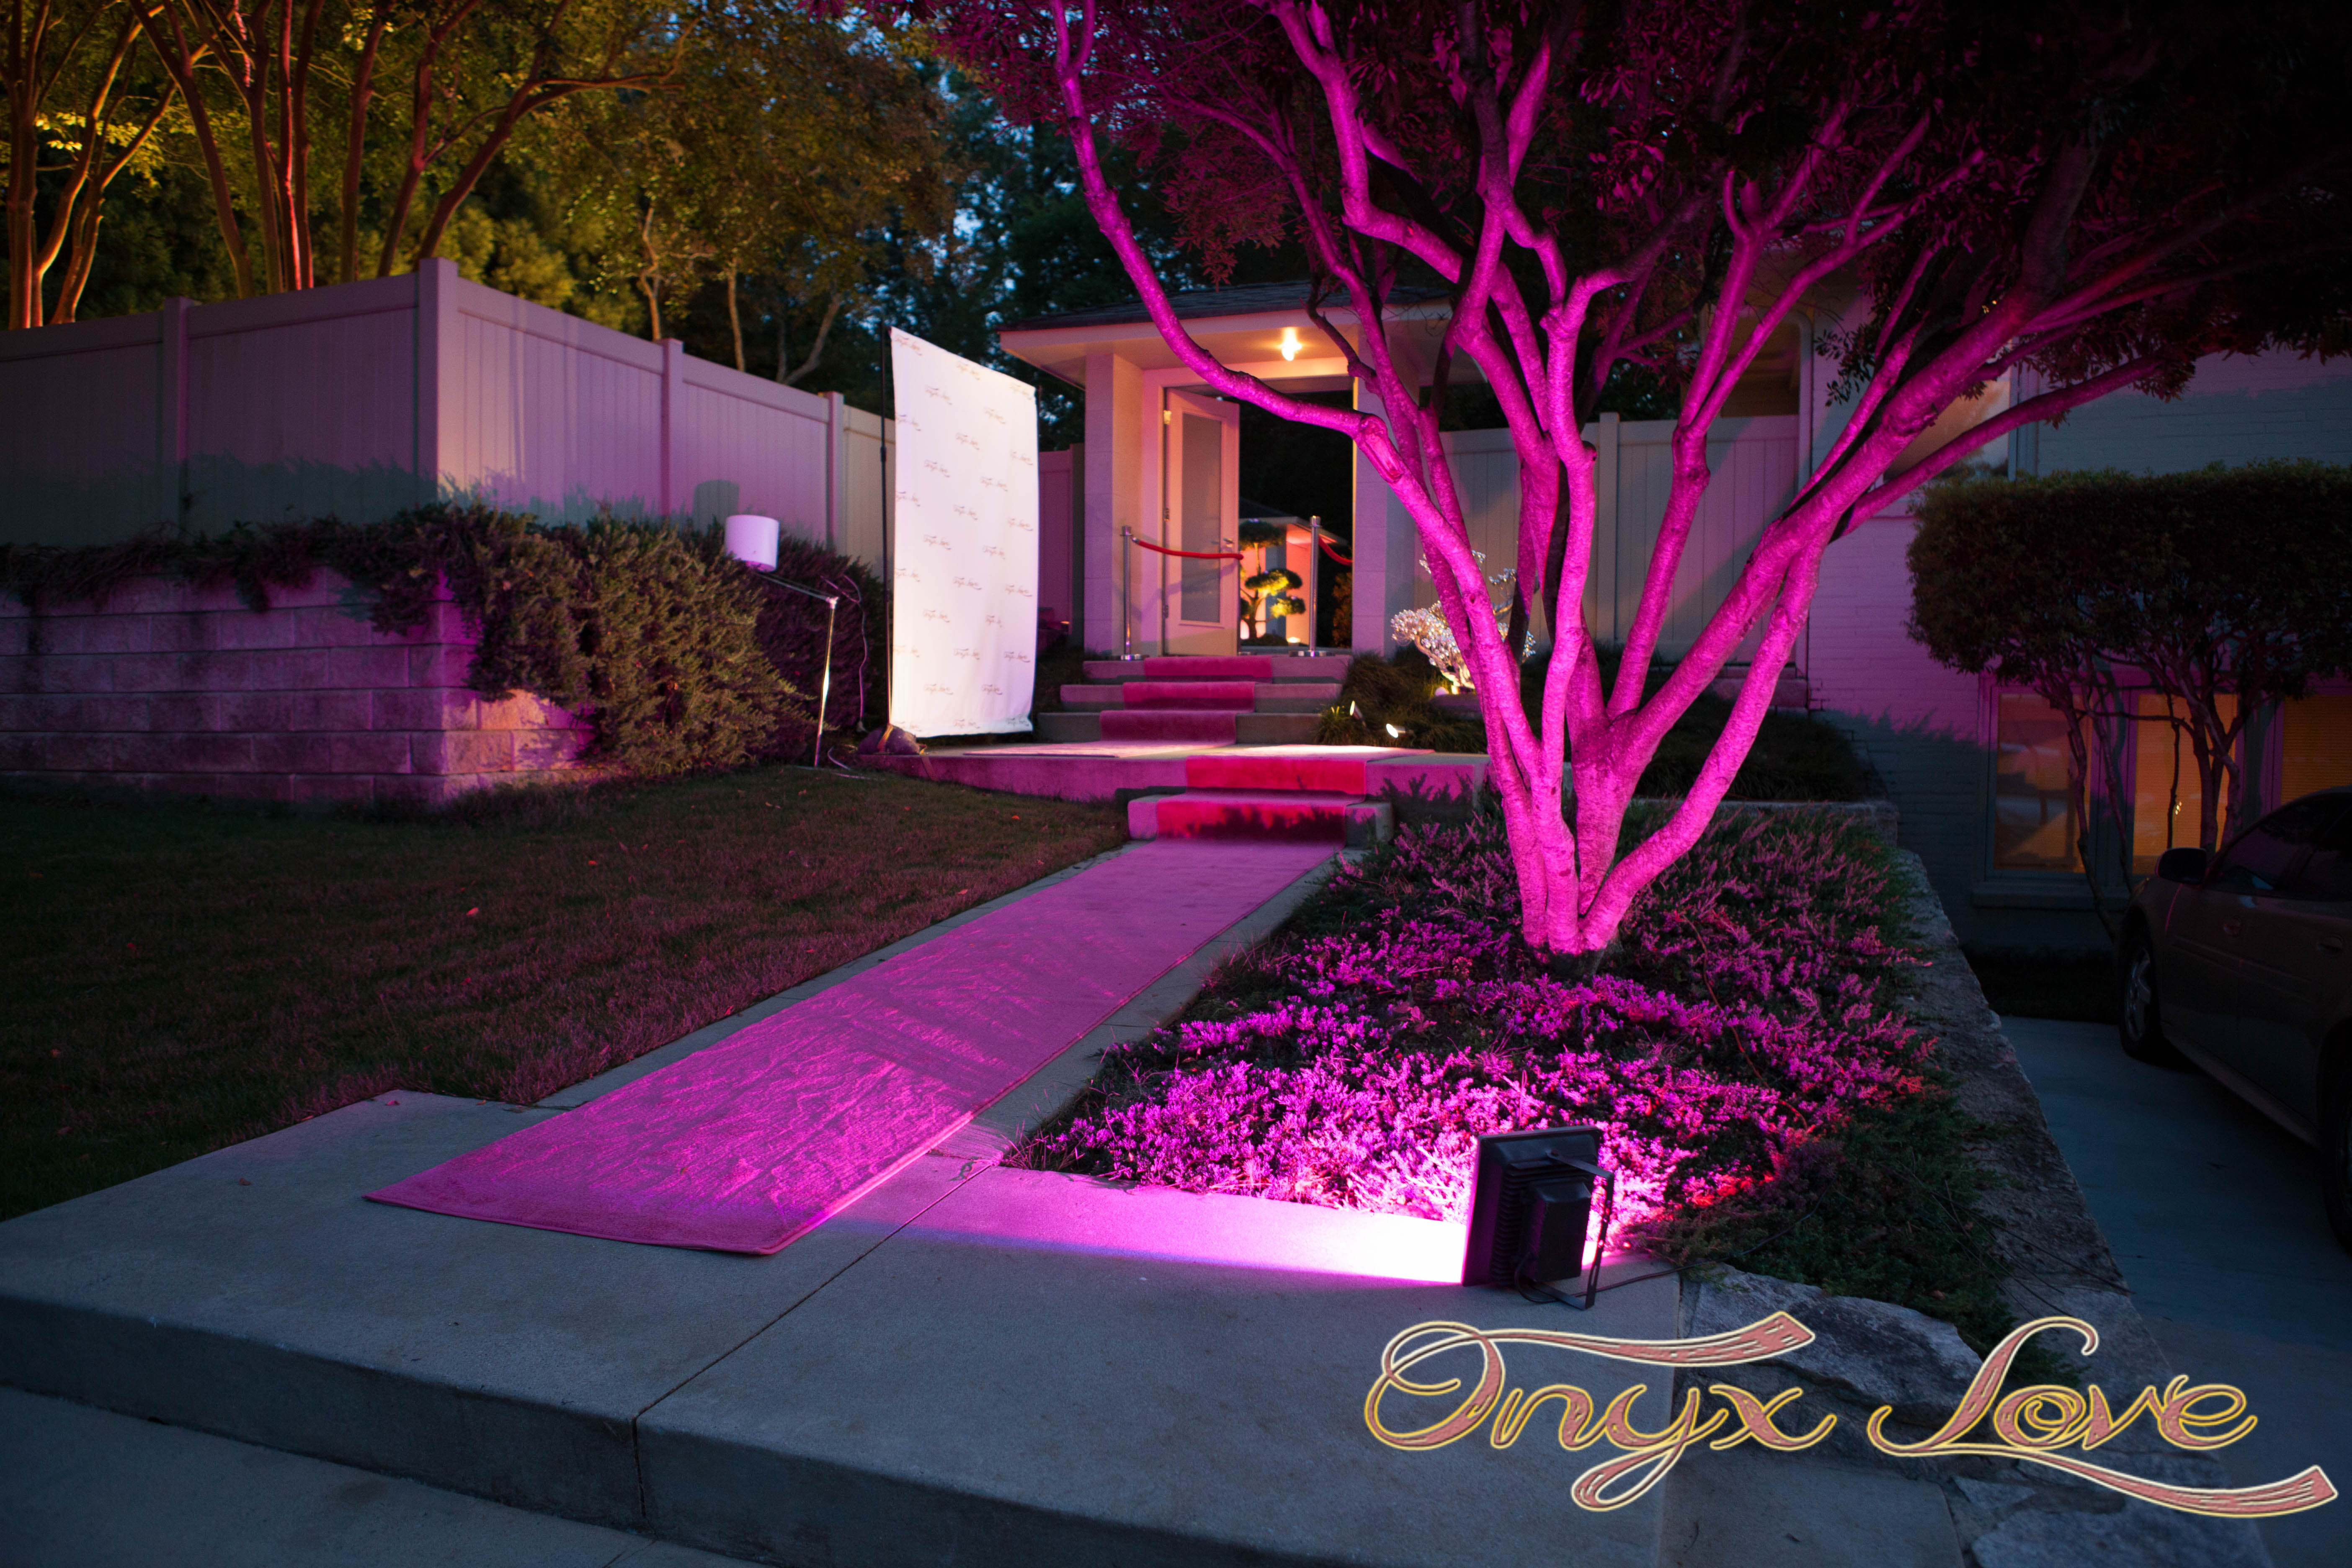 The Pink Carpet Walk